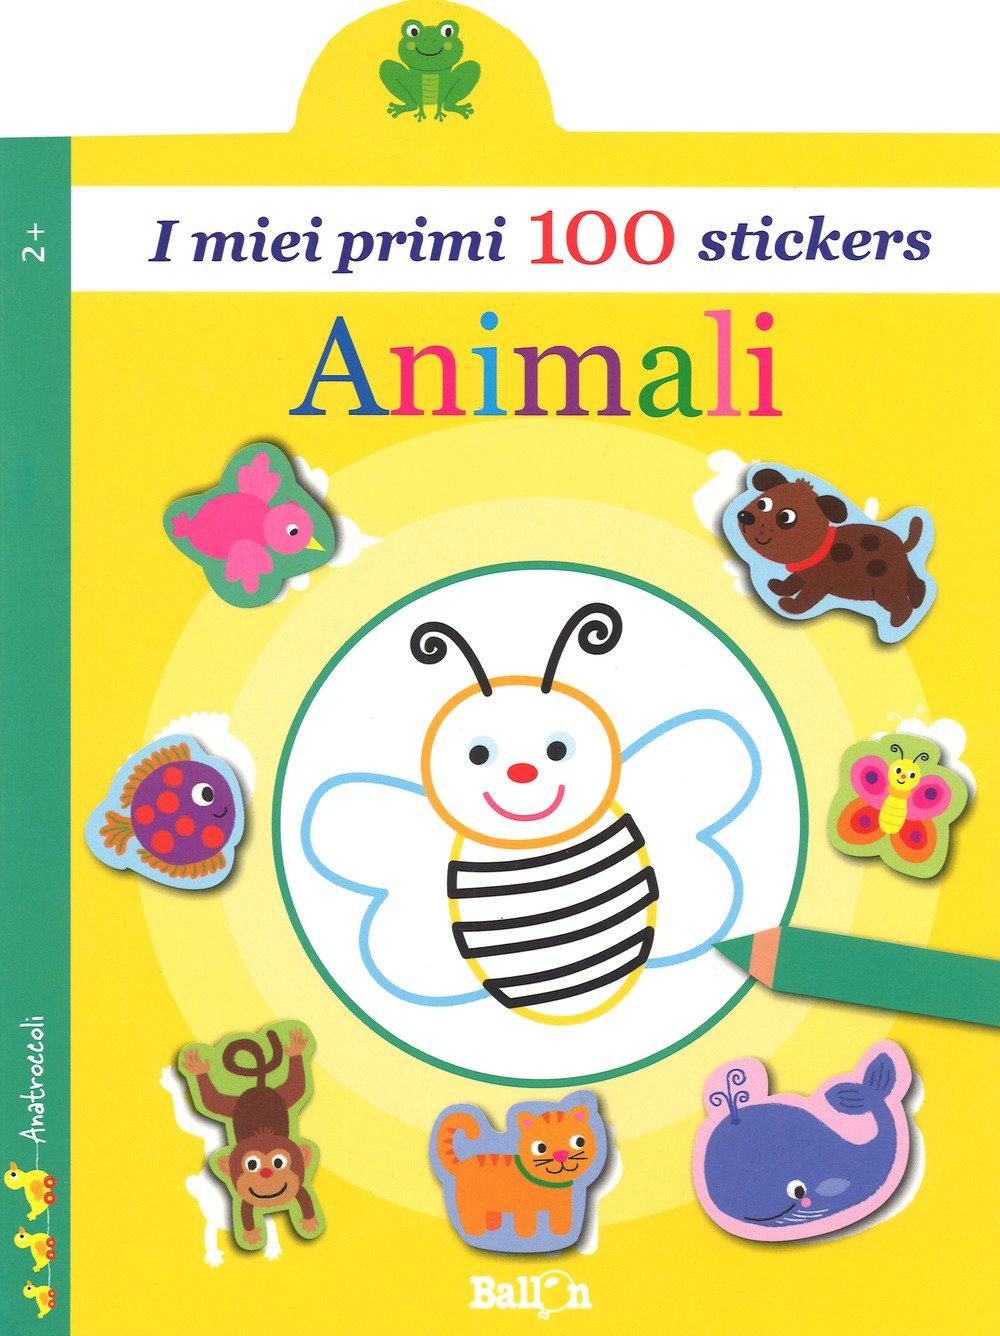 Animali. I miei primi 100 stickers